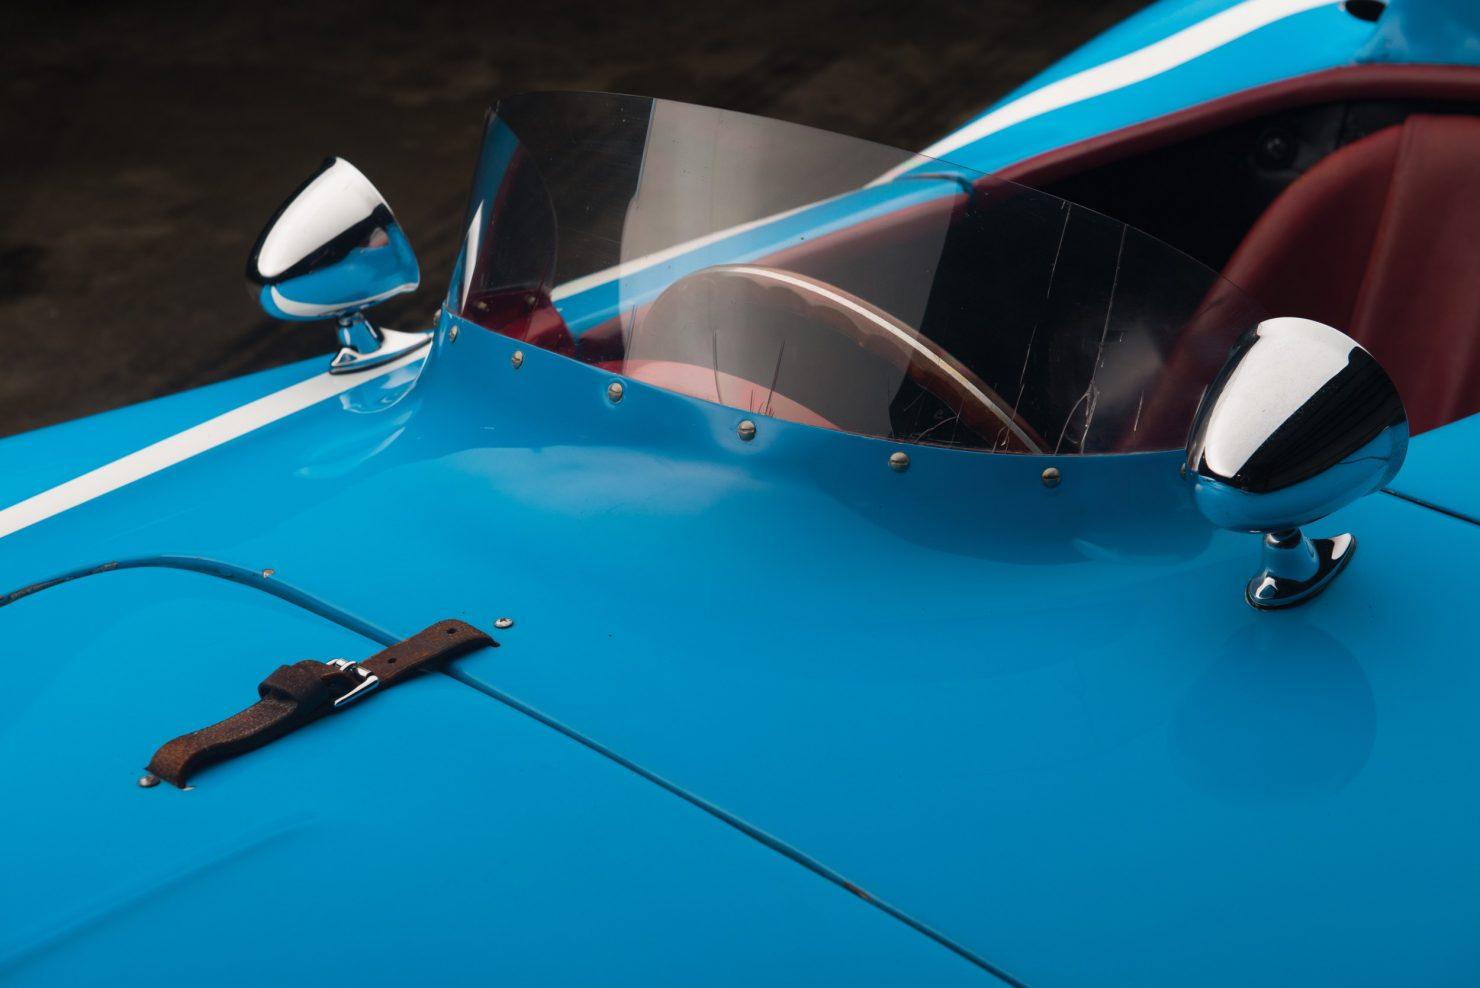 ferrari 121 lm spider 13 1480x988 - 1955 Ferrari 121 LM